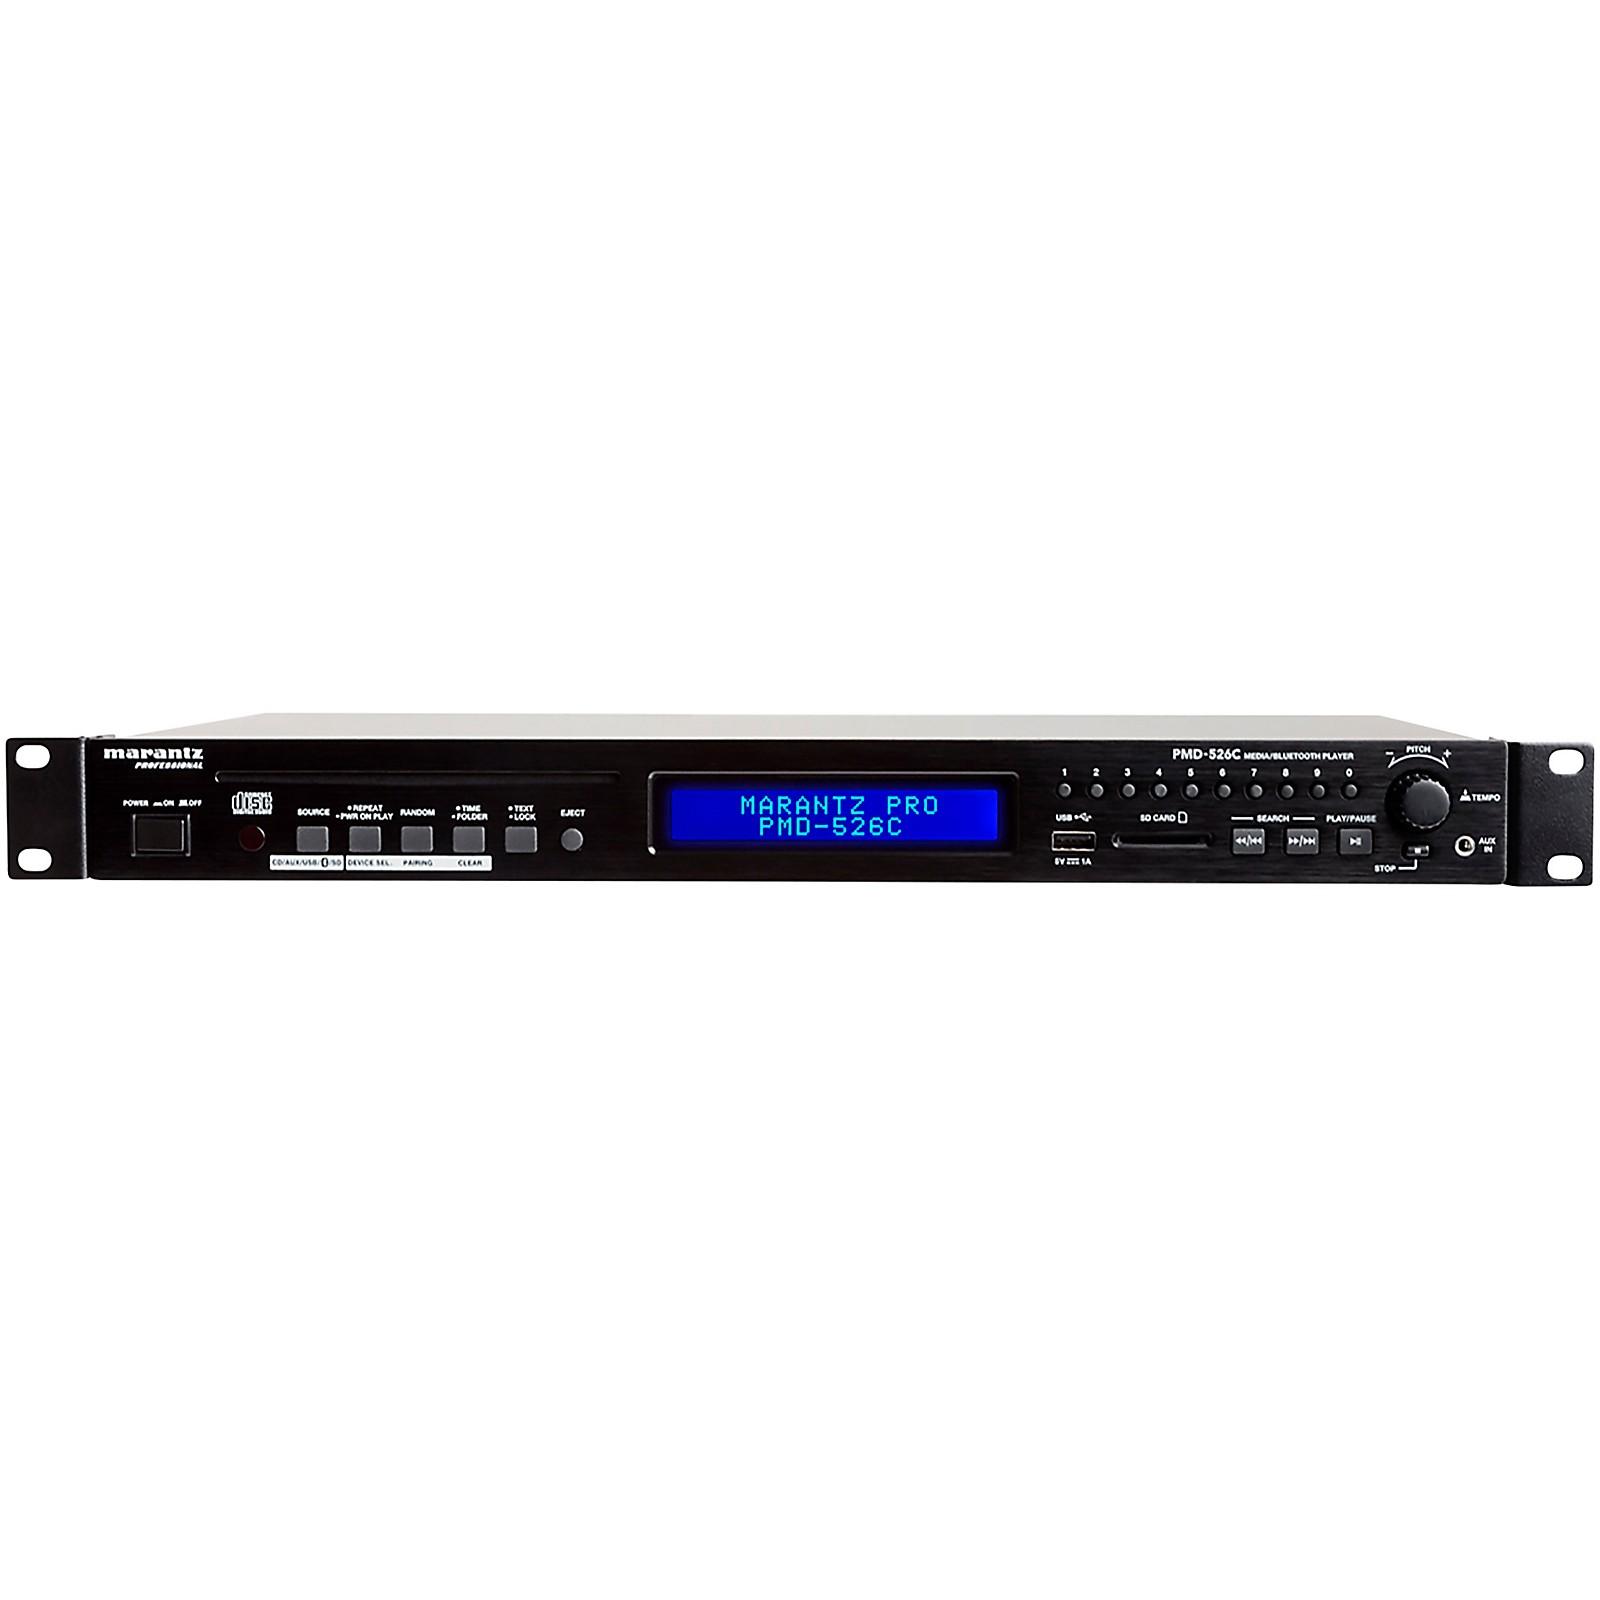 Marantz Professional PMD-526C CD/Media/Bluetooth Player with Remote